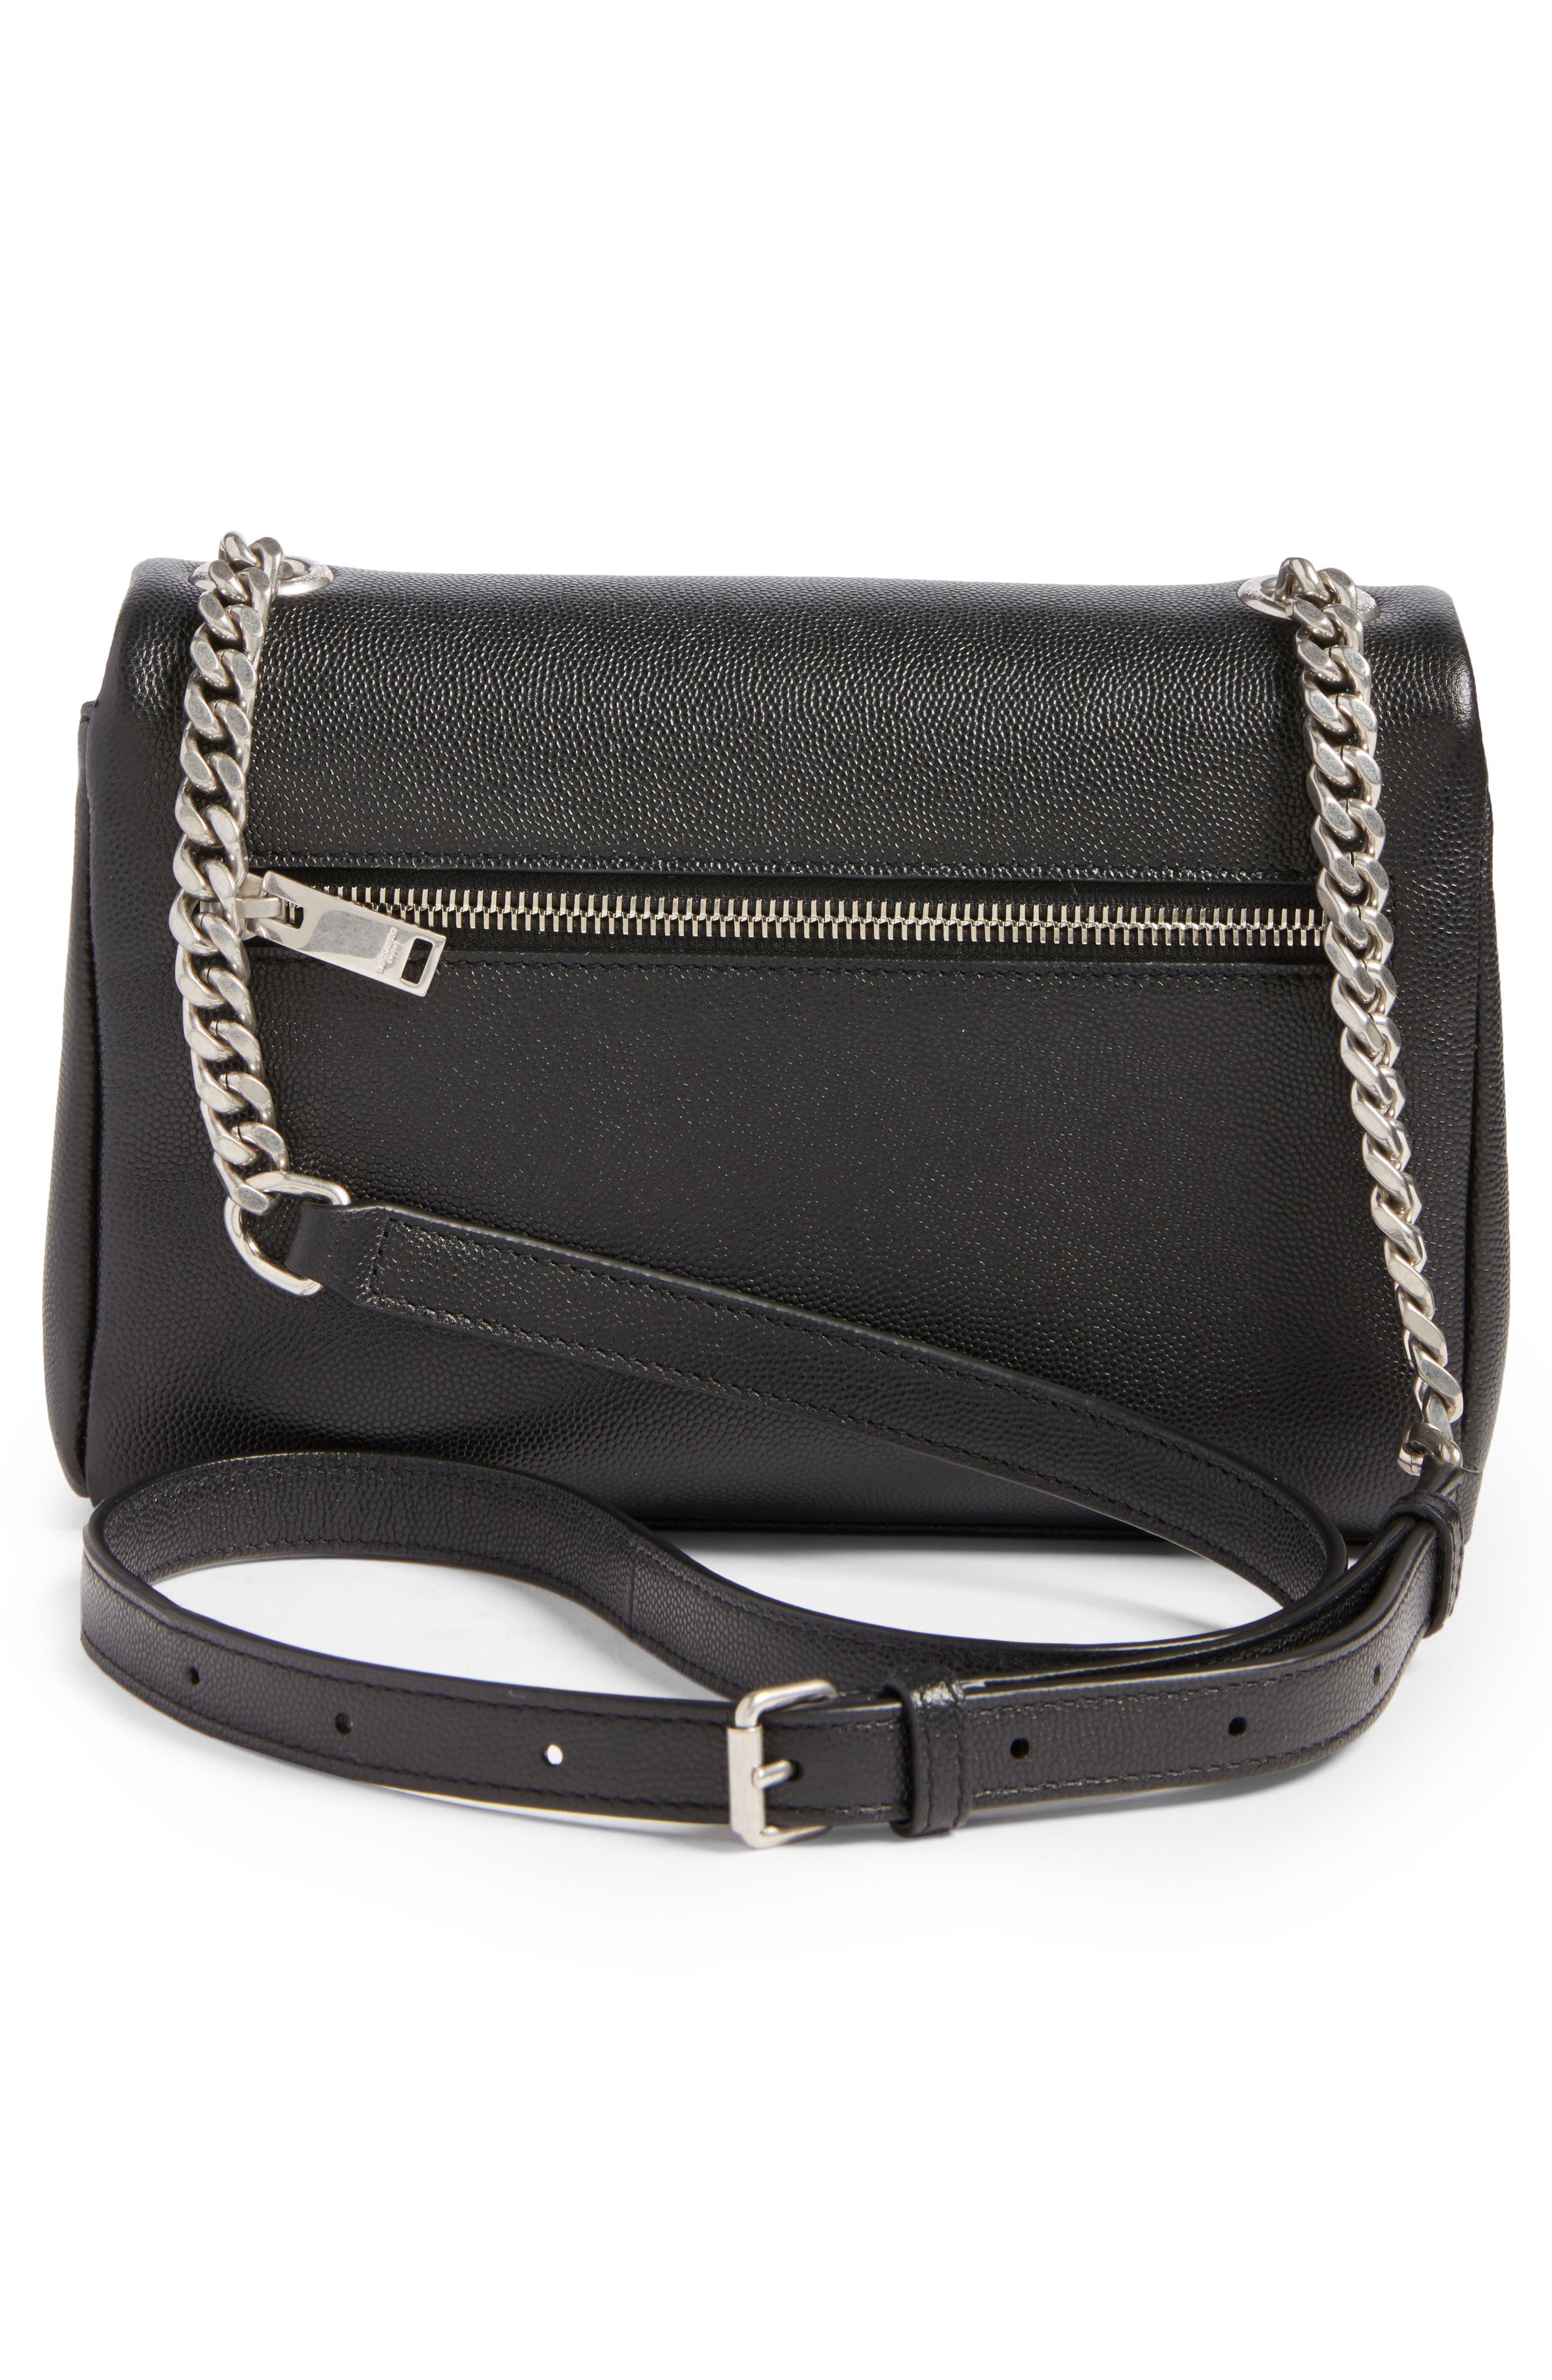 West Hollywood Calfskin Leather Messenger Bag,                             Alternate thumbnail 10, color,